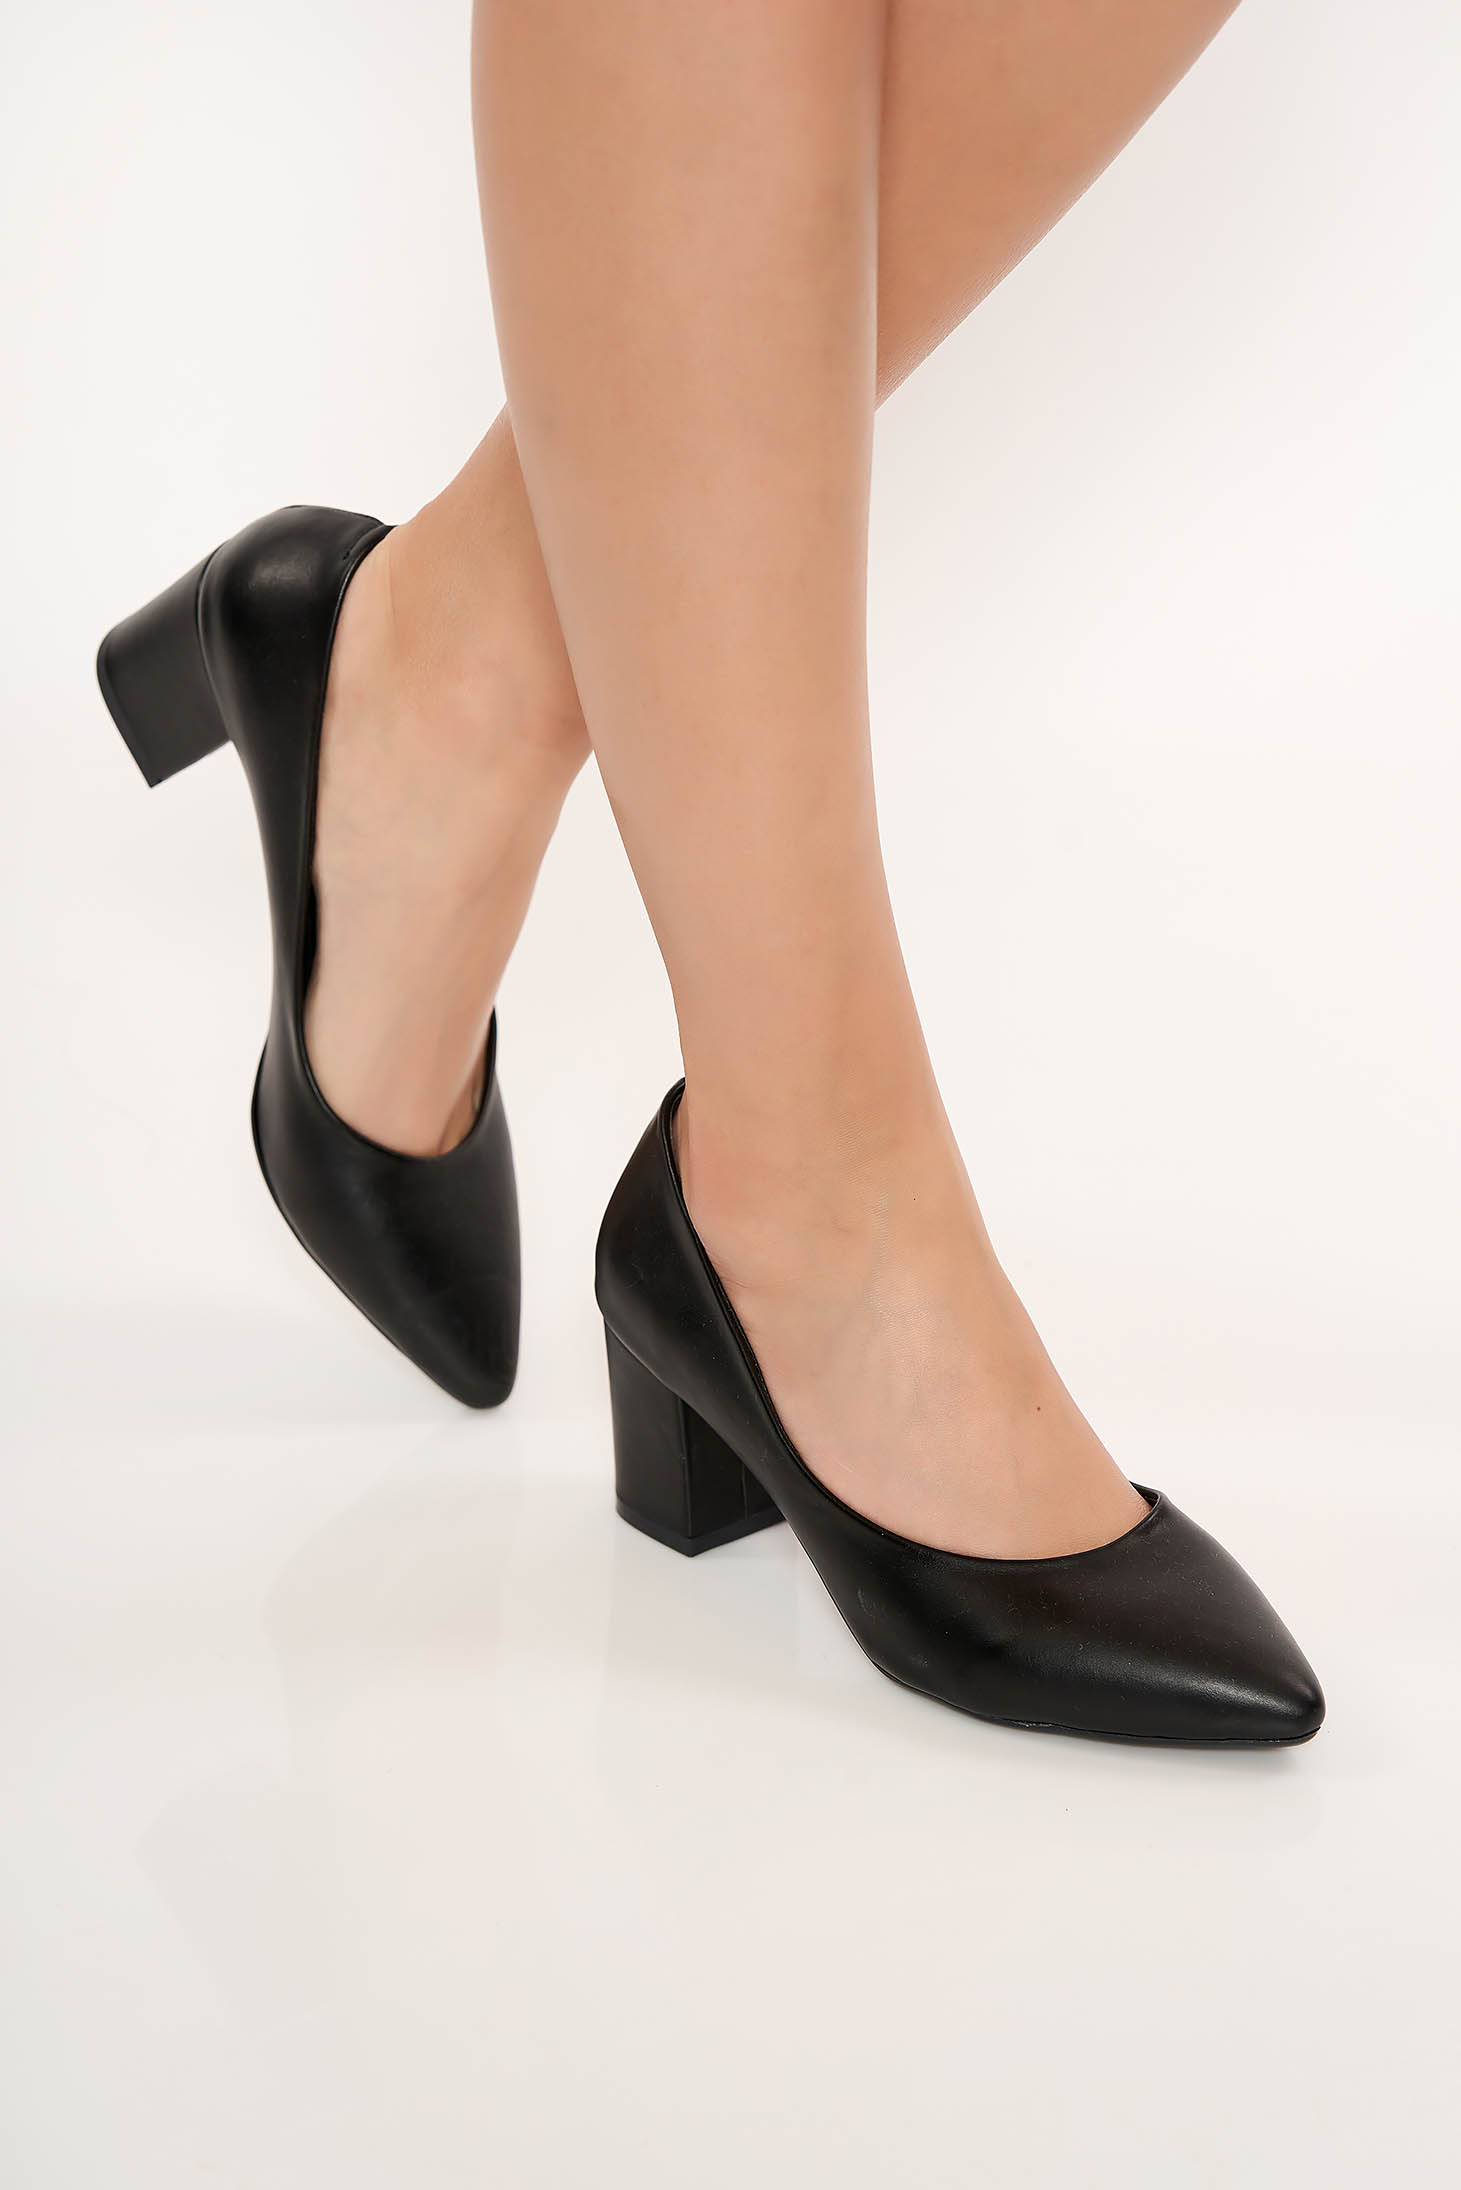 Pantofi negru cu toc gros cu varful usor ascutit